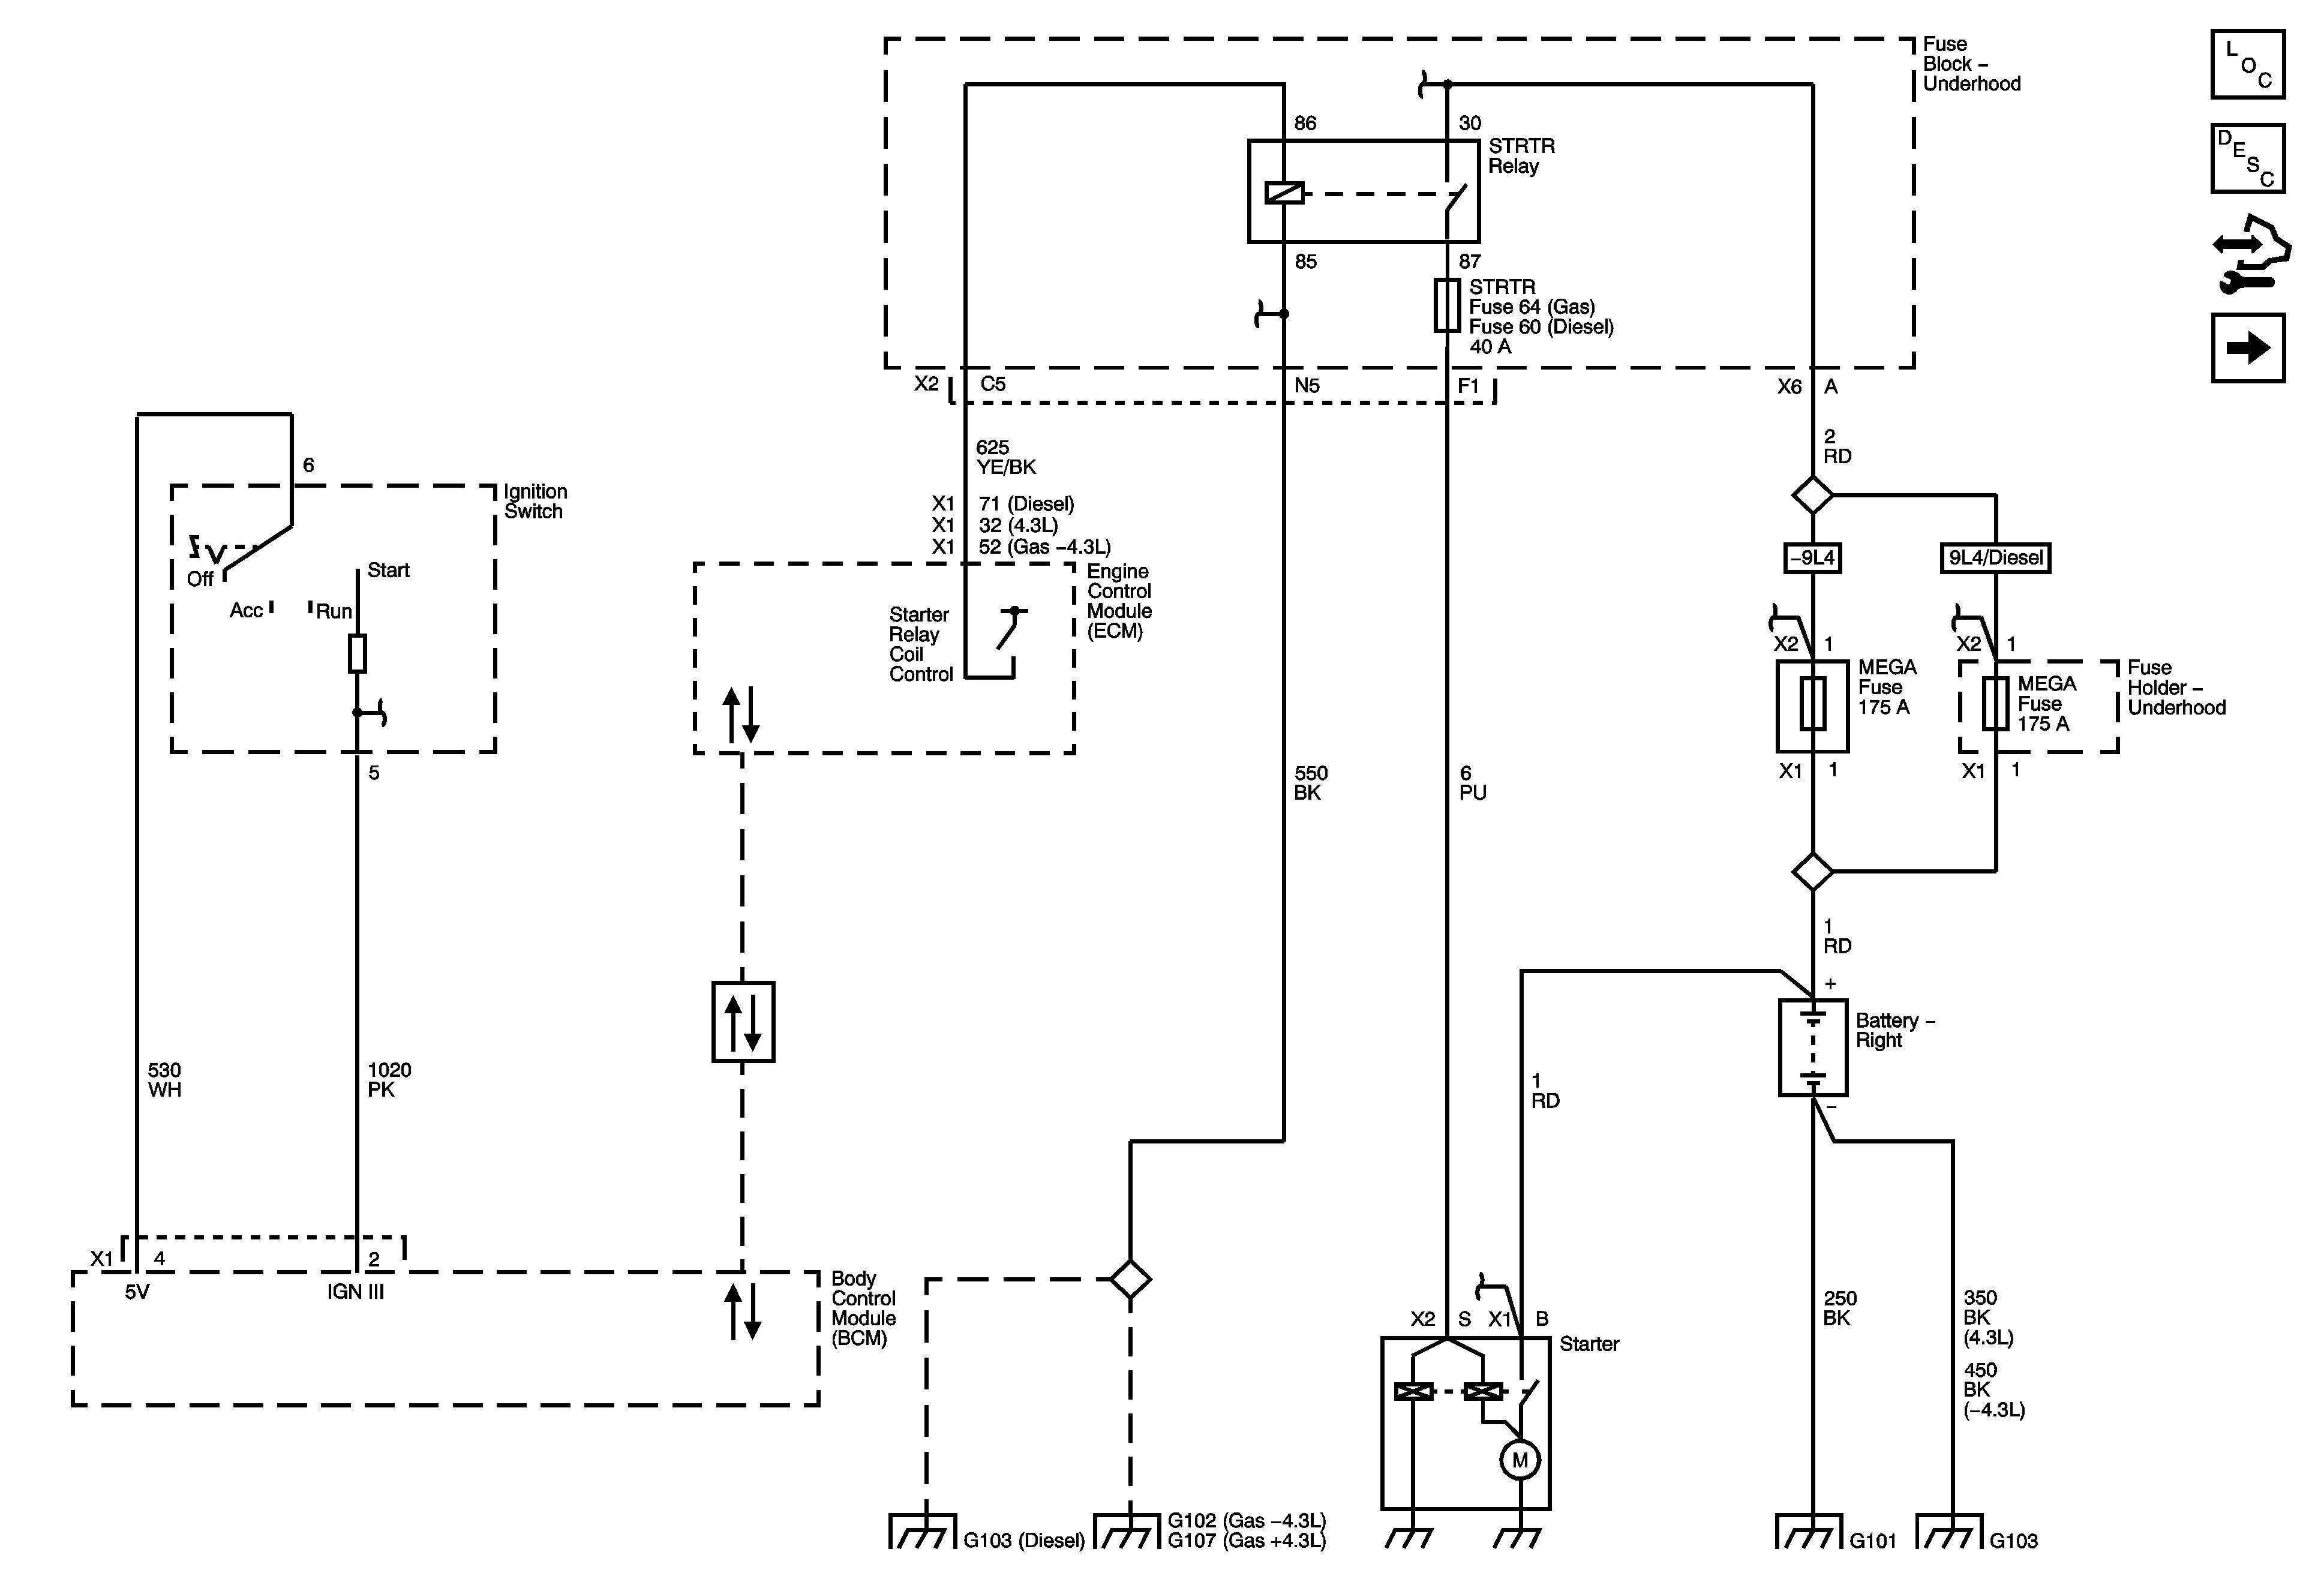 Diesel Engine Starter Wiring Diagram Unique Steering Wheel Radio Controls Wiring Diagram Diagram Of Diesel Engine Starter Wiring Diagram